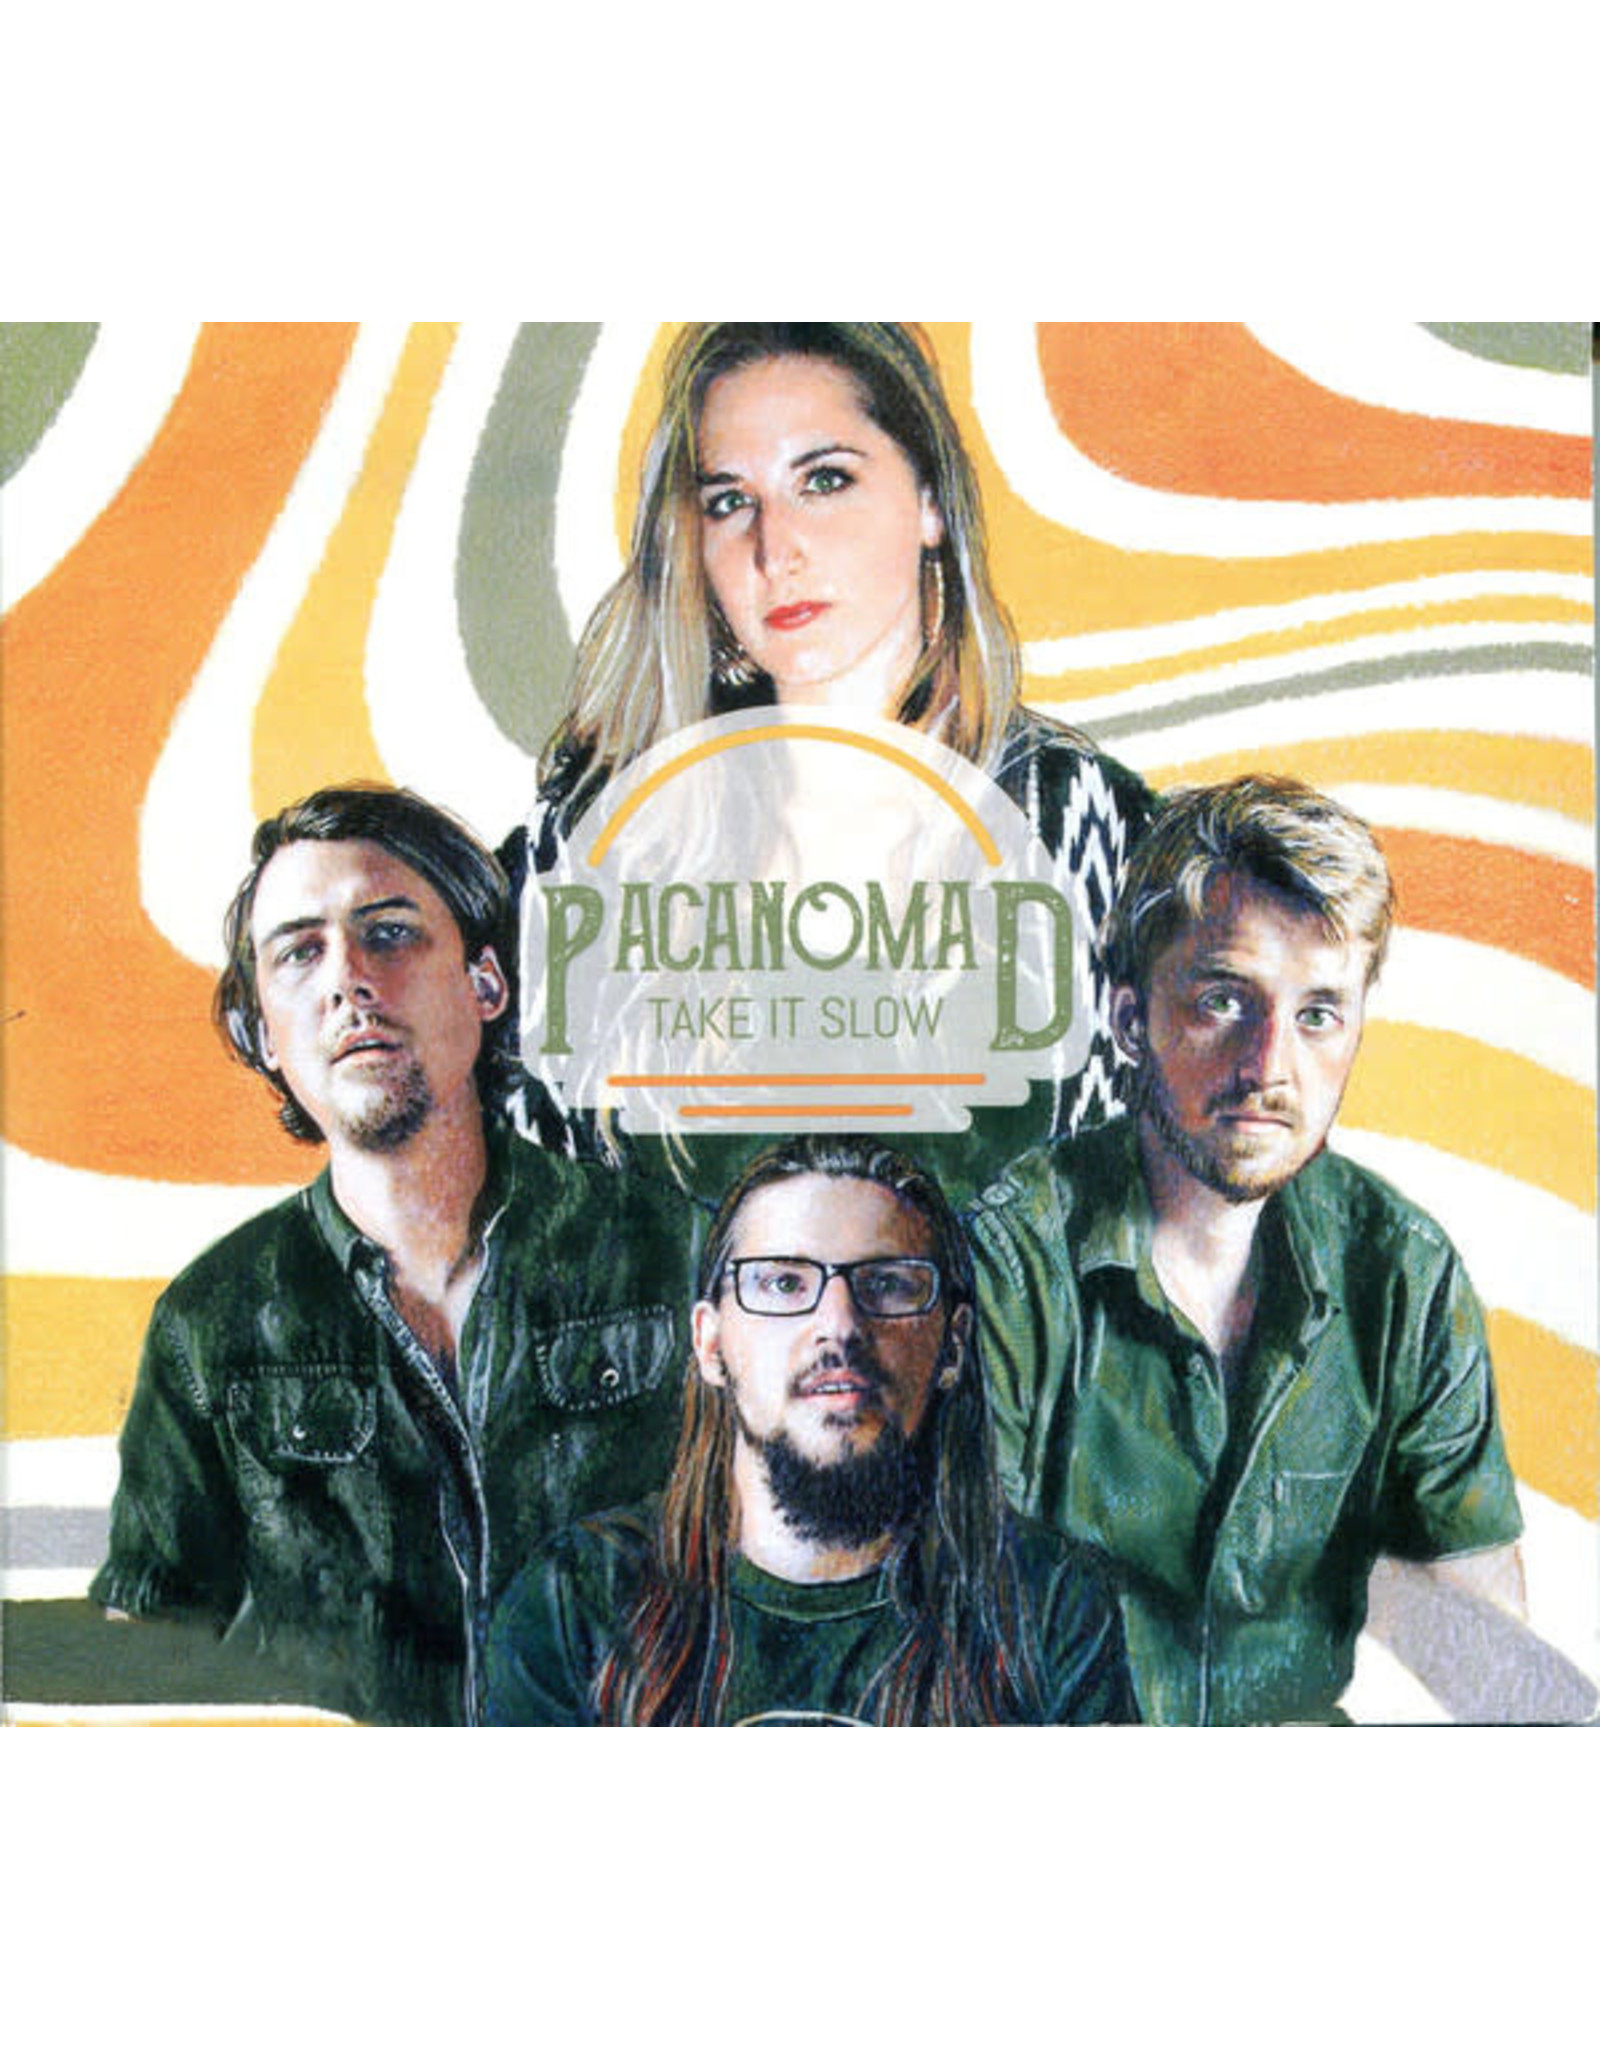 Pacanomad - Take It Slow CD